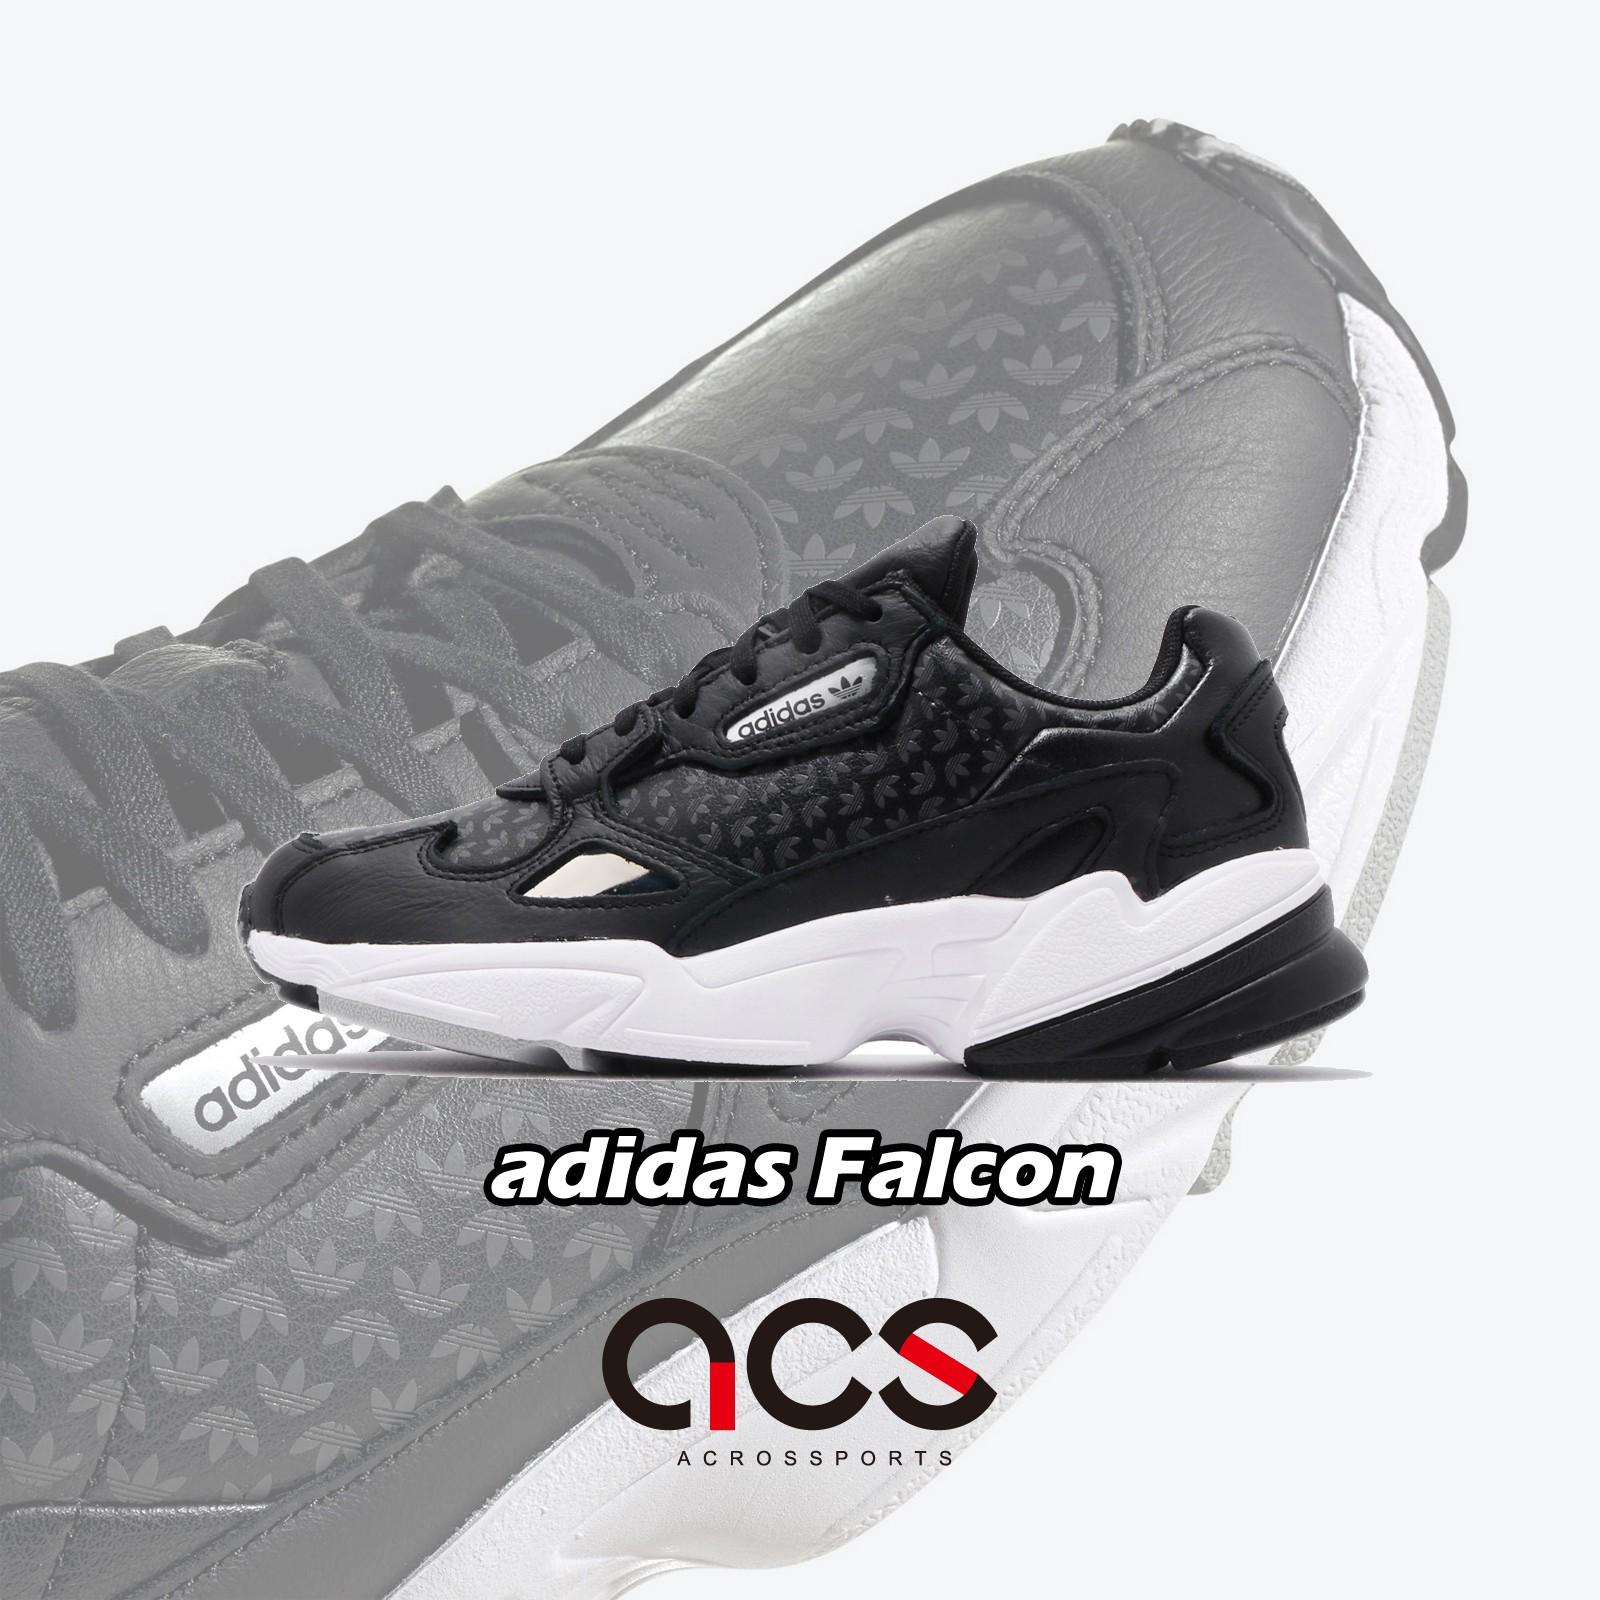 adidas 休閒鞋 Falcon W 黑 白 女鞋 老爹鞋 運動鞋 FV9033 【ACS】